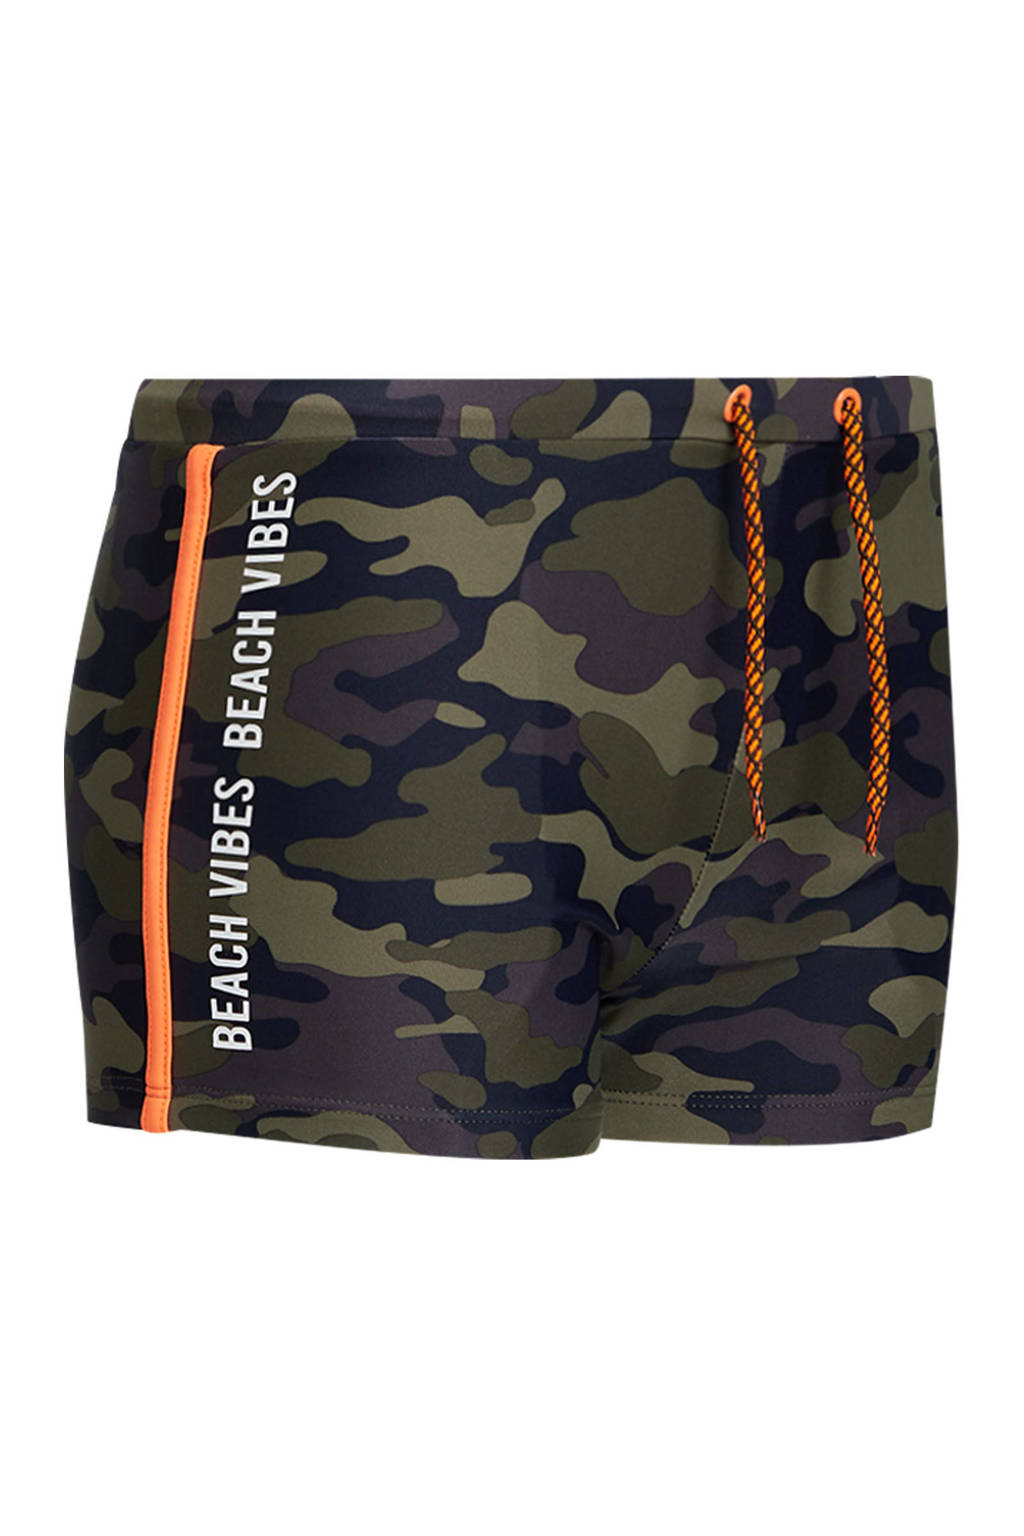 WE Fashion zwemboxer met camouflageprint legergroen, Legergroen